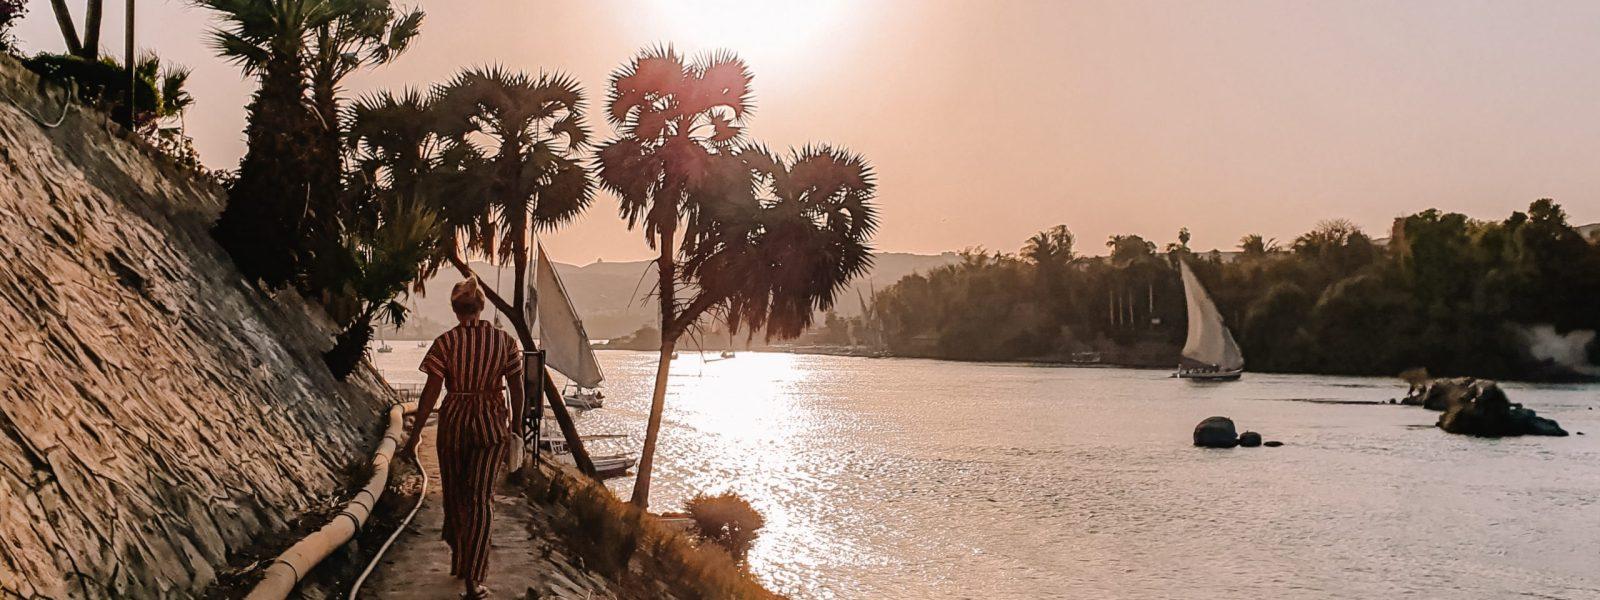 Elephantine Island, de beste plek bij Aswan om te slapen